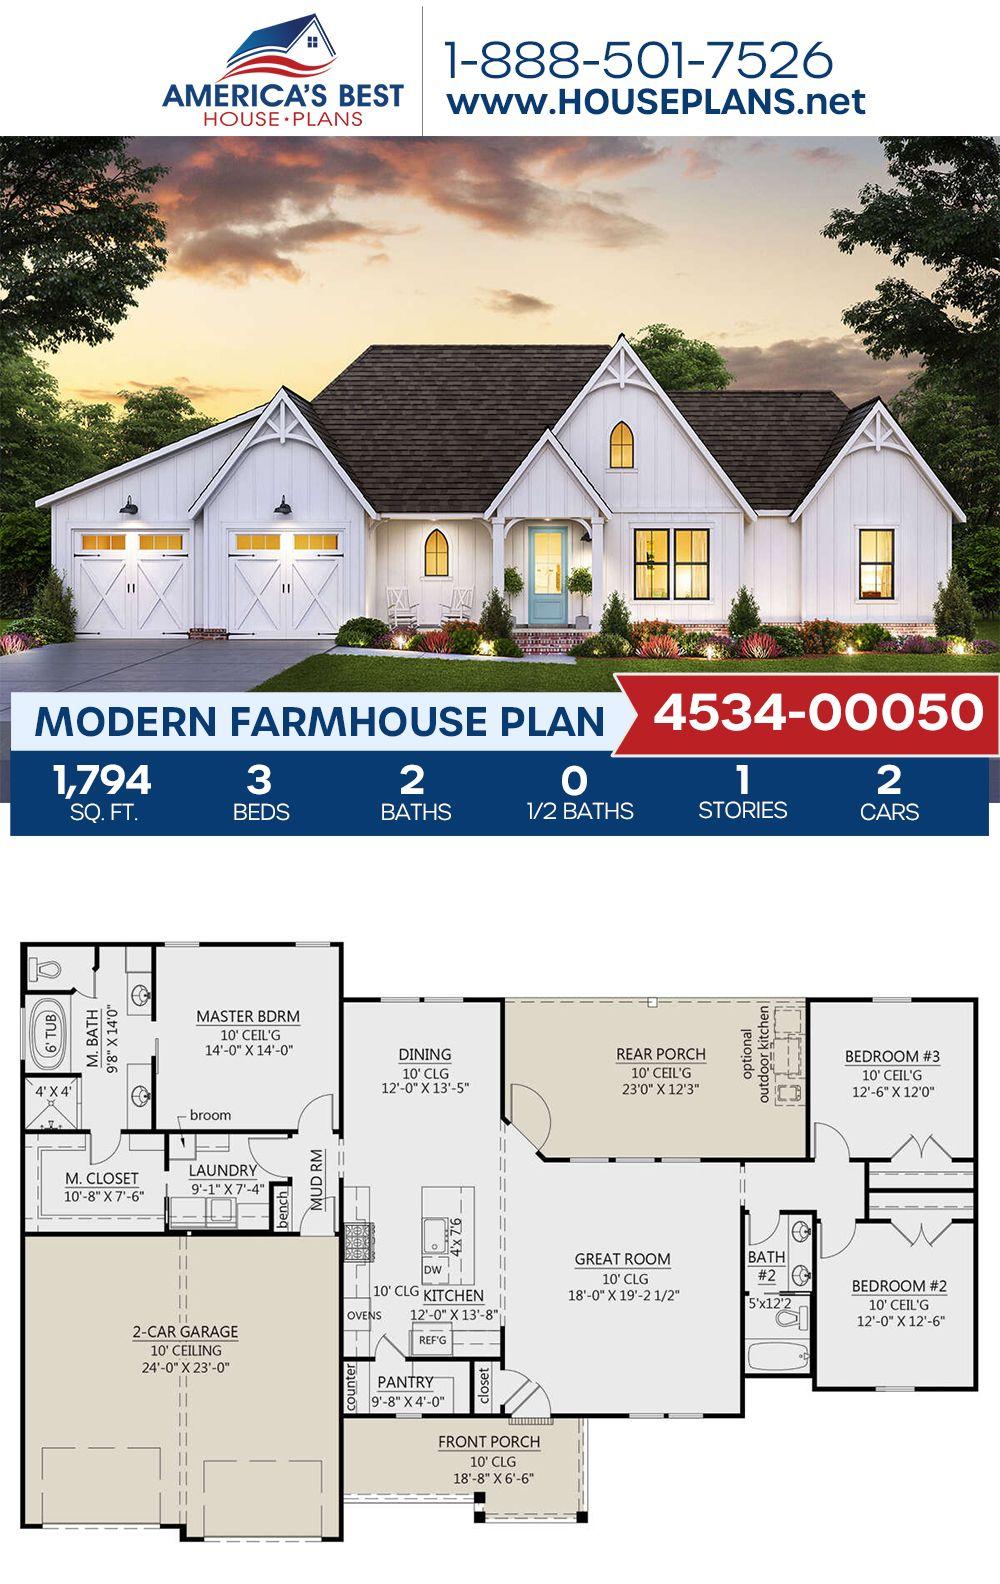 House Plan 4534 00050 Modern Farmhouse Plan 1 794 Square Feet 3 Bedrooms 2 Bathrooms Modern Farmhouse Plans Farmhouse Plans House Plans